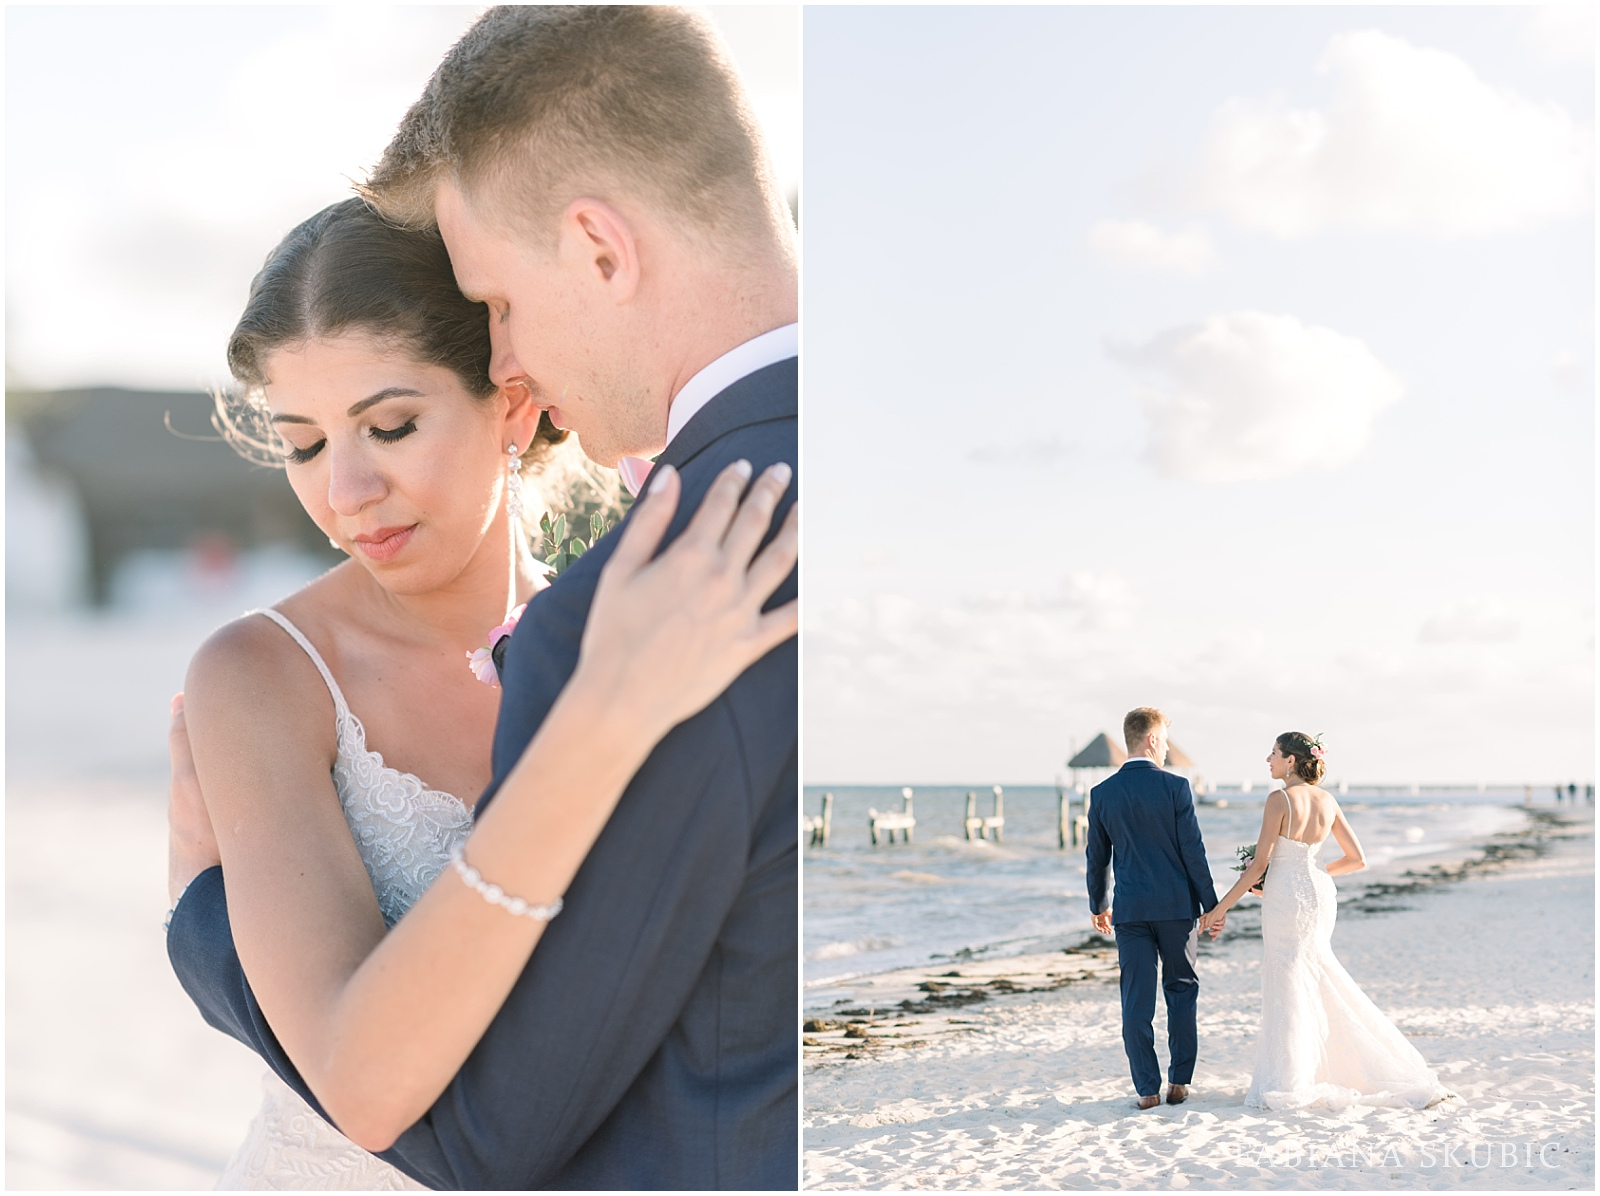 TJ_Now_Sapphire_Riviera_Cancun_Mexico_Wedding_Photos_0251.jpg